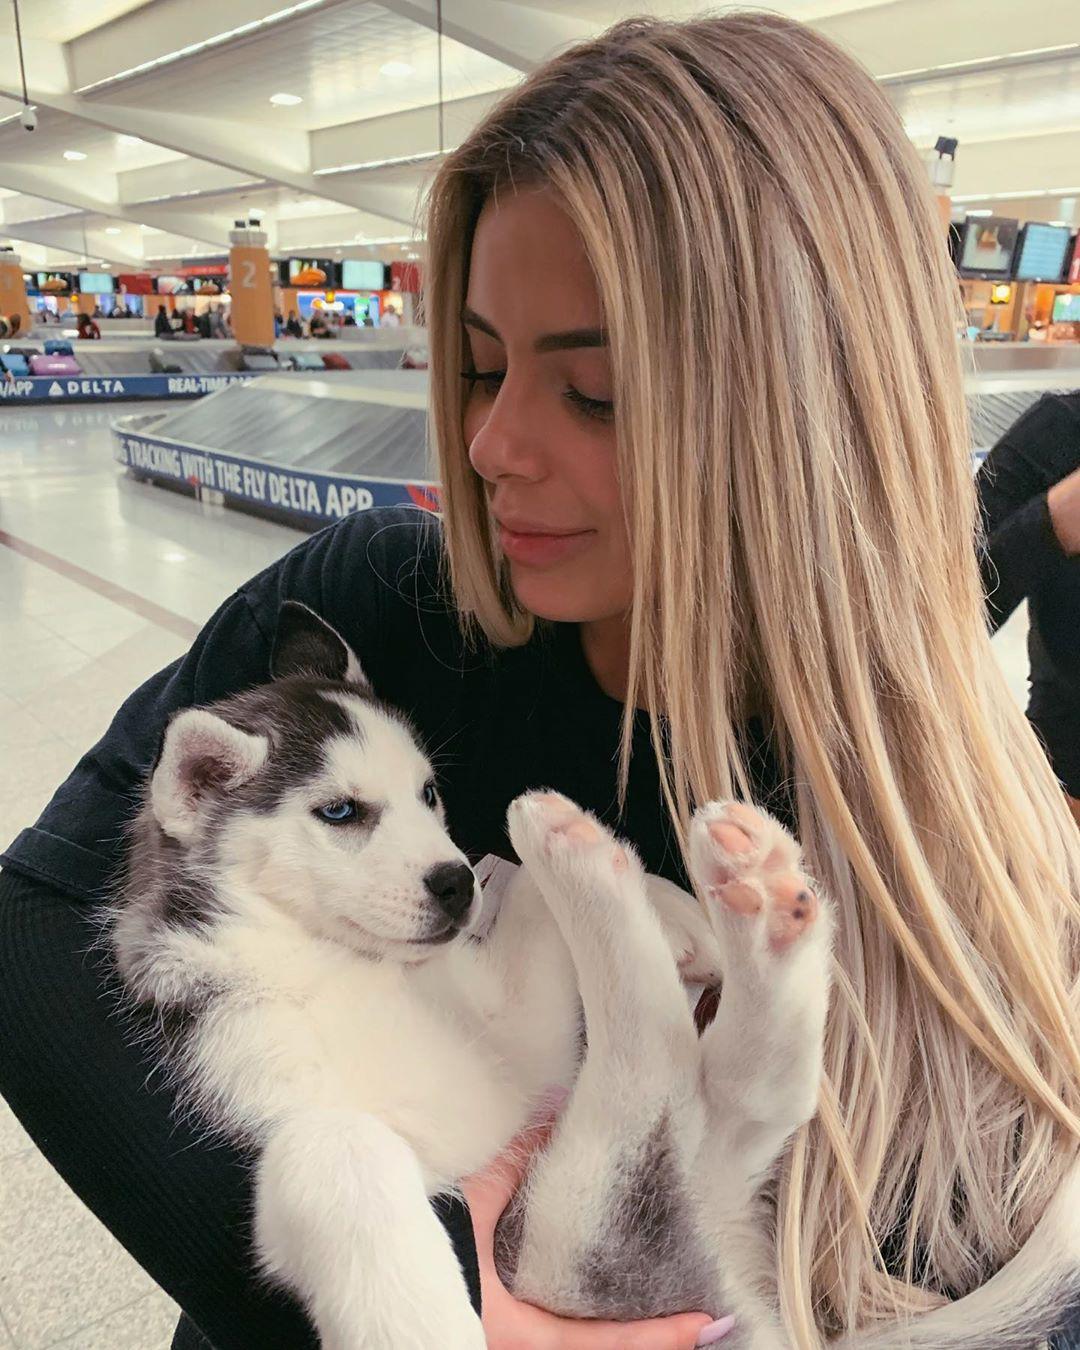 Brielle Biermann Instagram Pictures, Miniature Siberian Husky, Canadian Eskimo dog